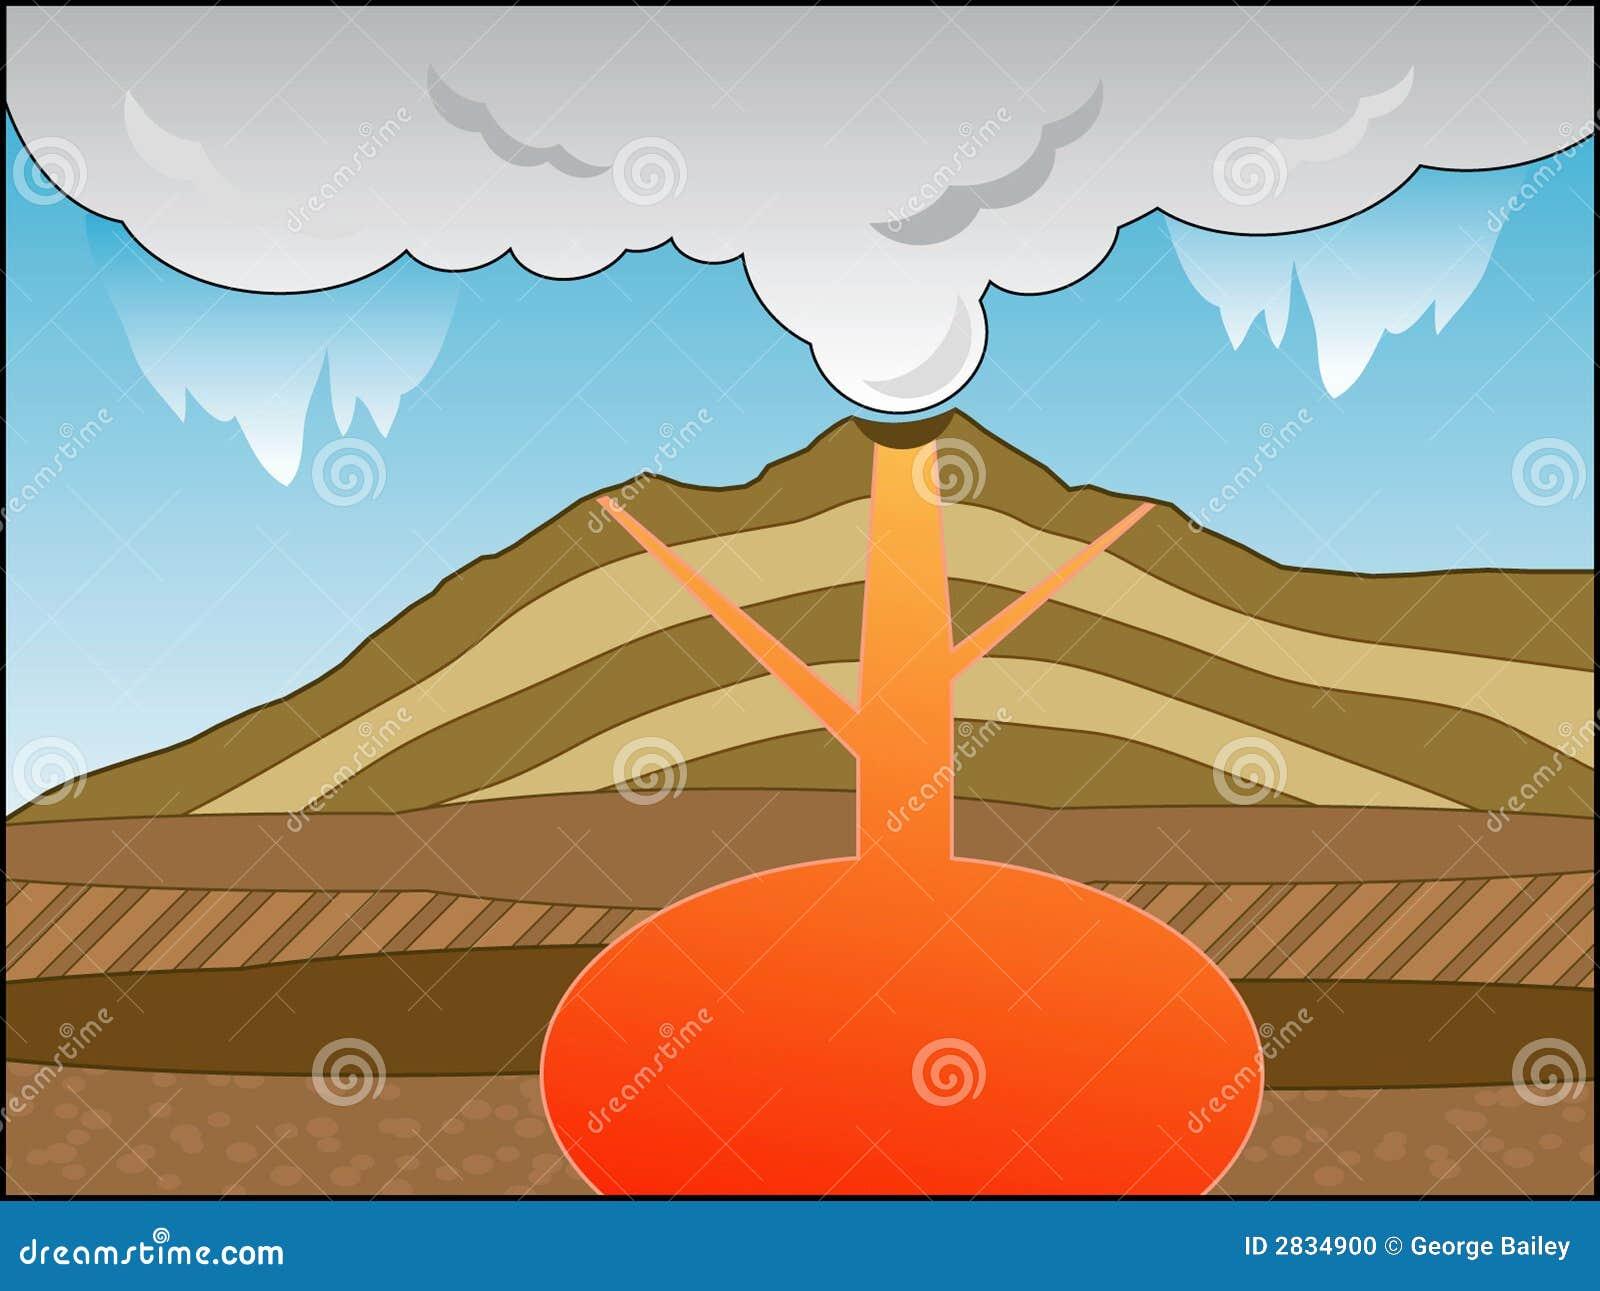 Volcano cross section stock vector illustration of magma 2834900 download volcano cross section stock vector illustration of magma 2834900 ccuart Gallery